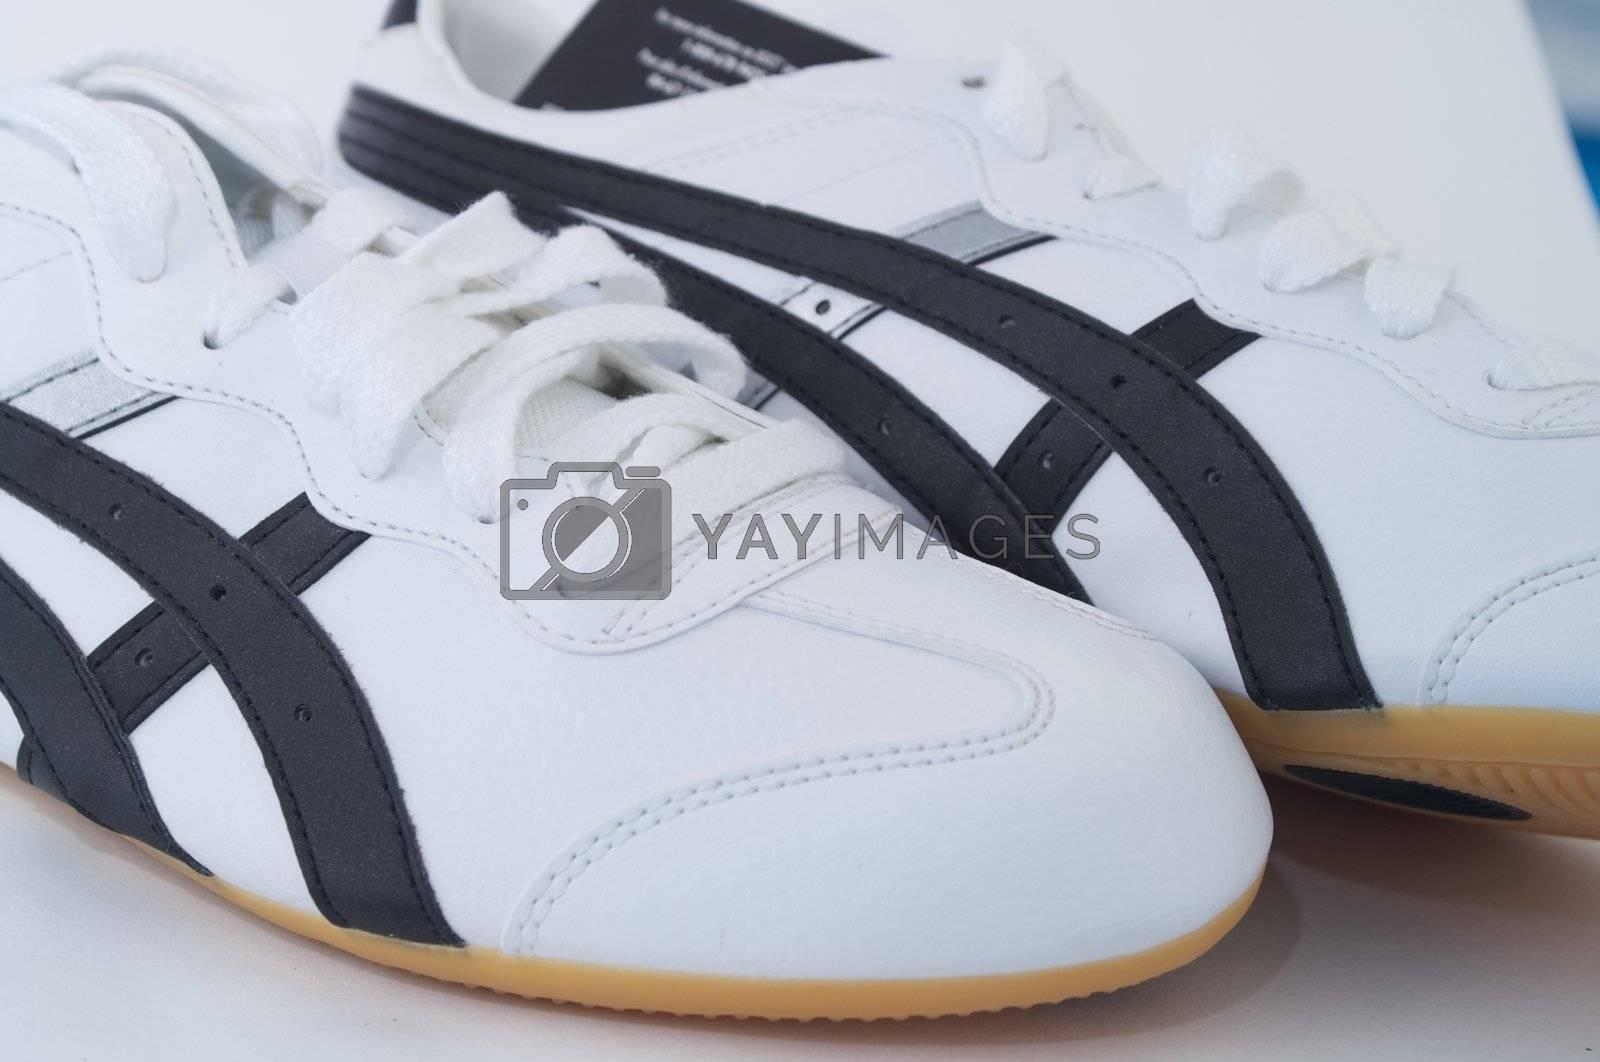 White gym shoes